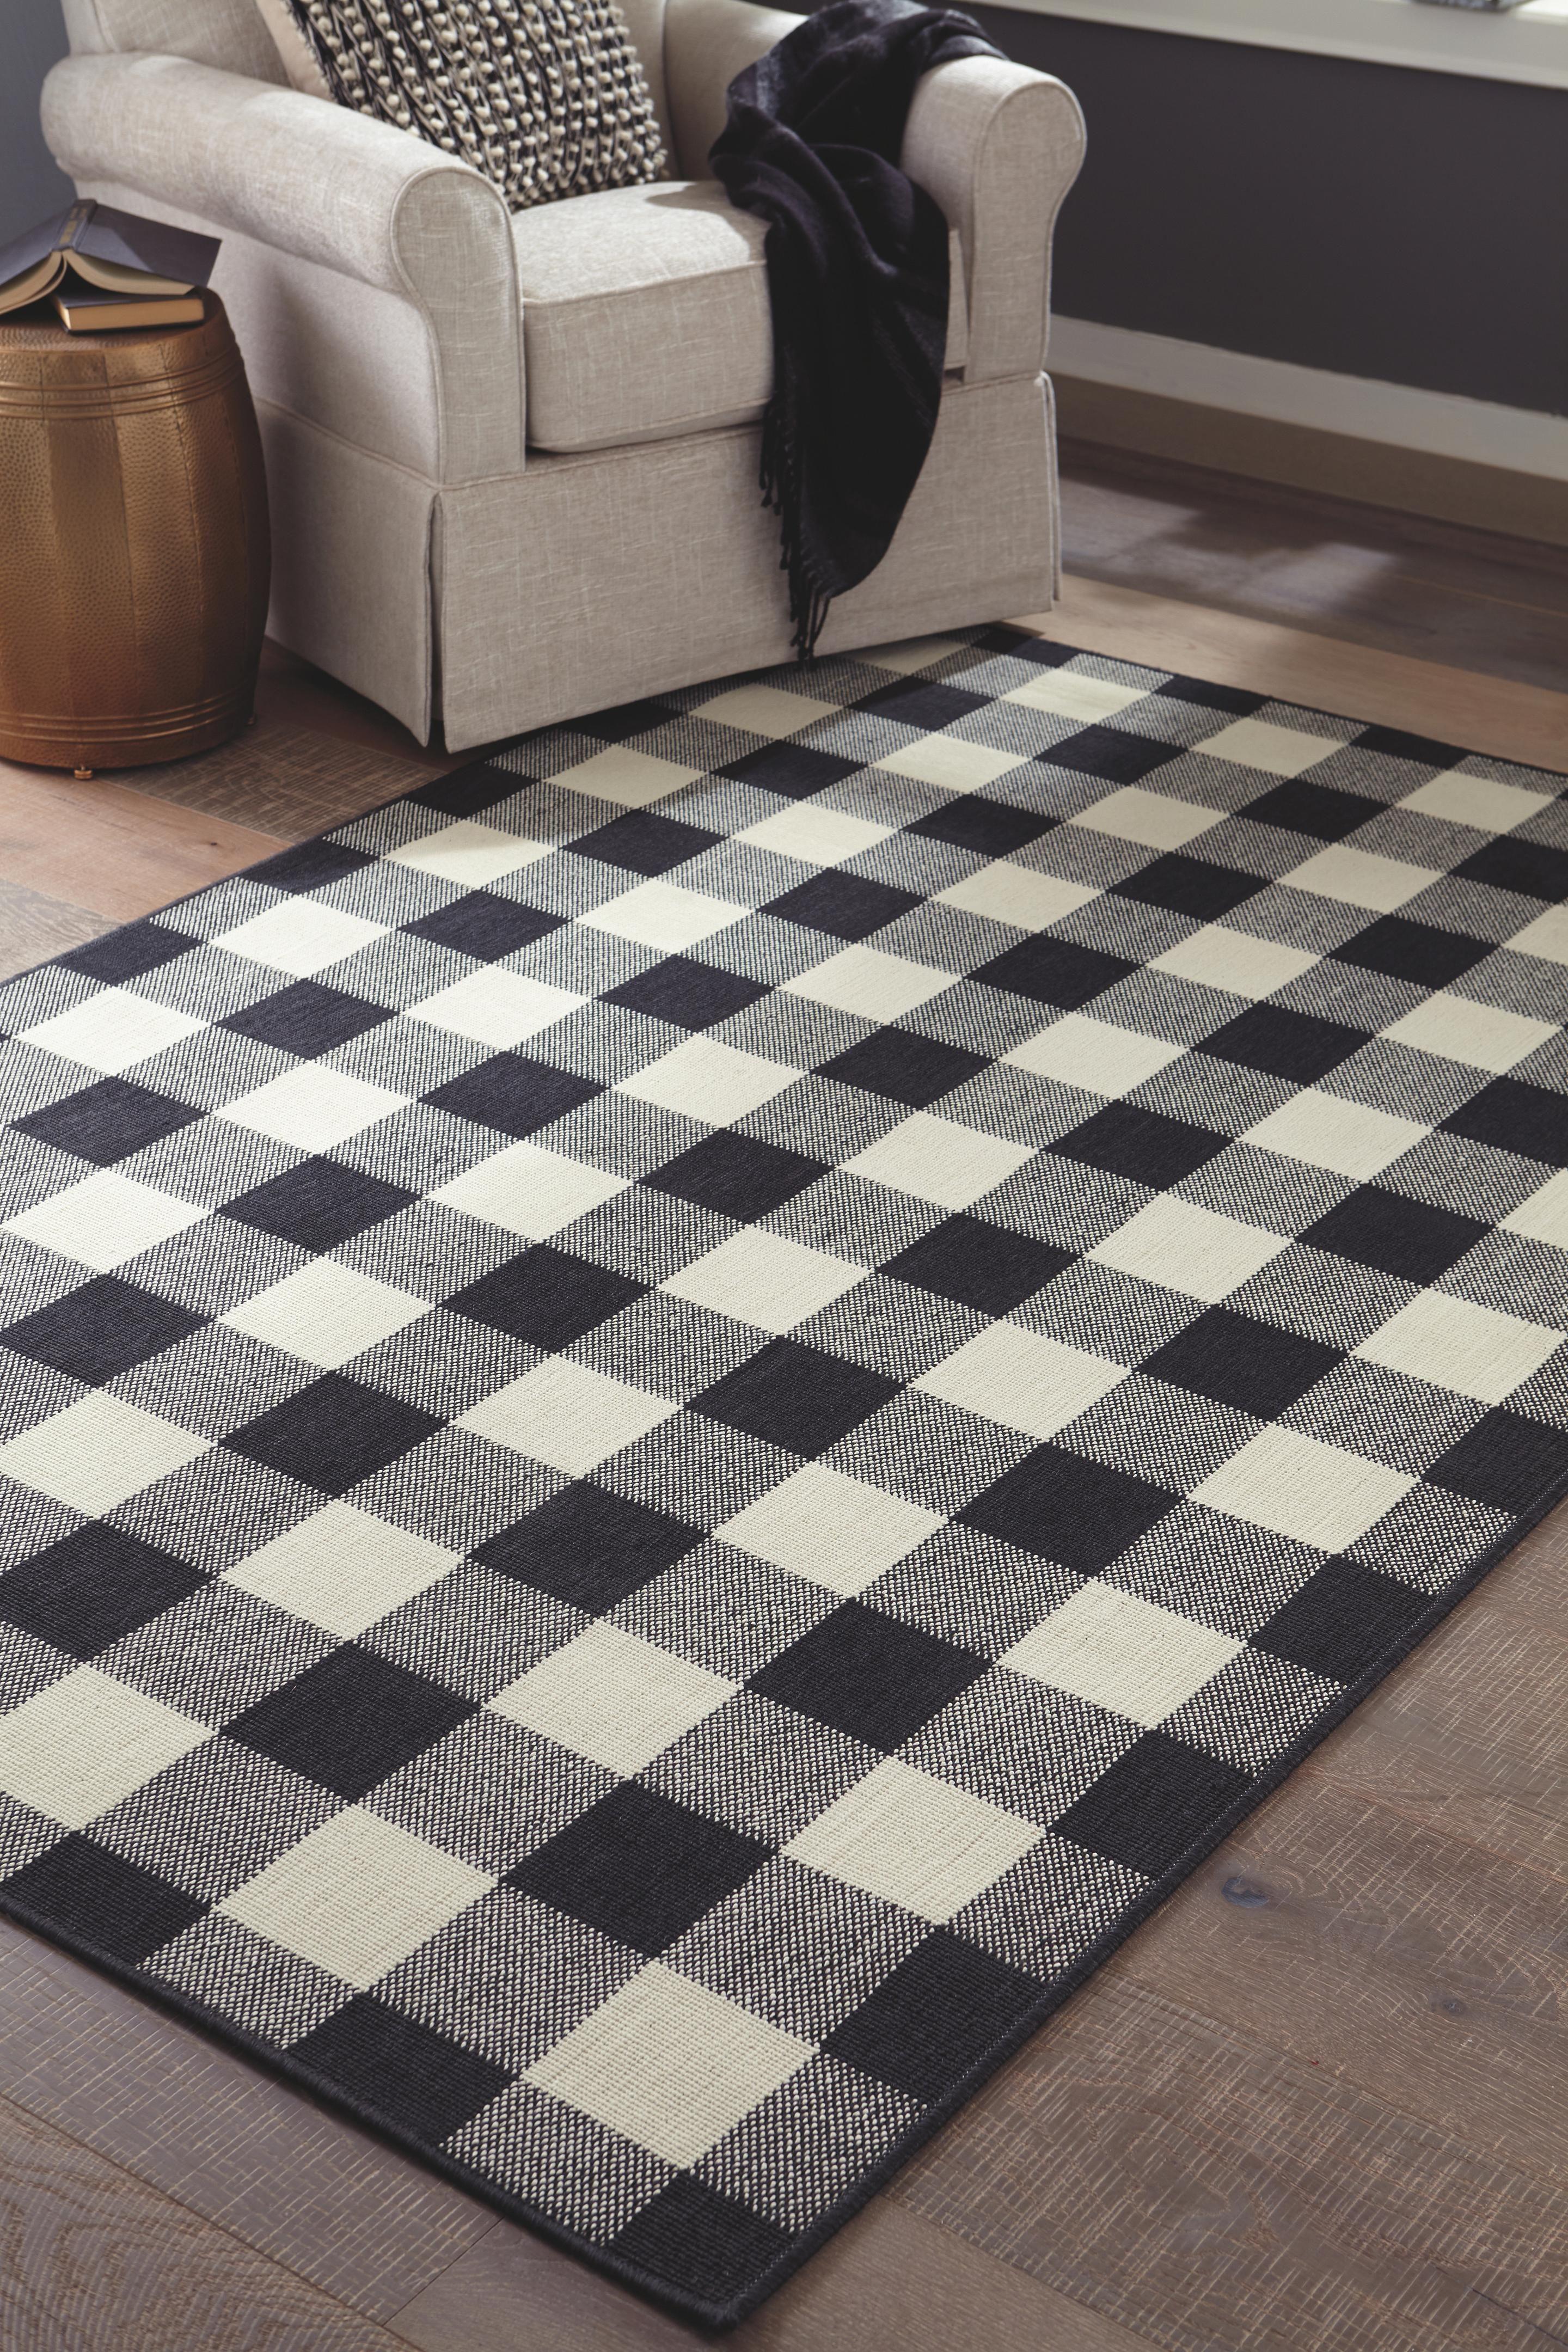 Carpet Runners 36 Inches Wide 4runnercarpetfloormats Plaid Decor Farmhouse Rugs Rugs